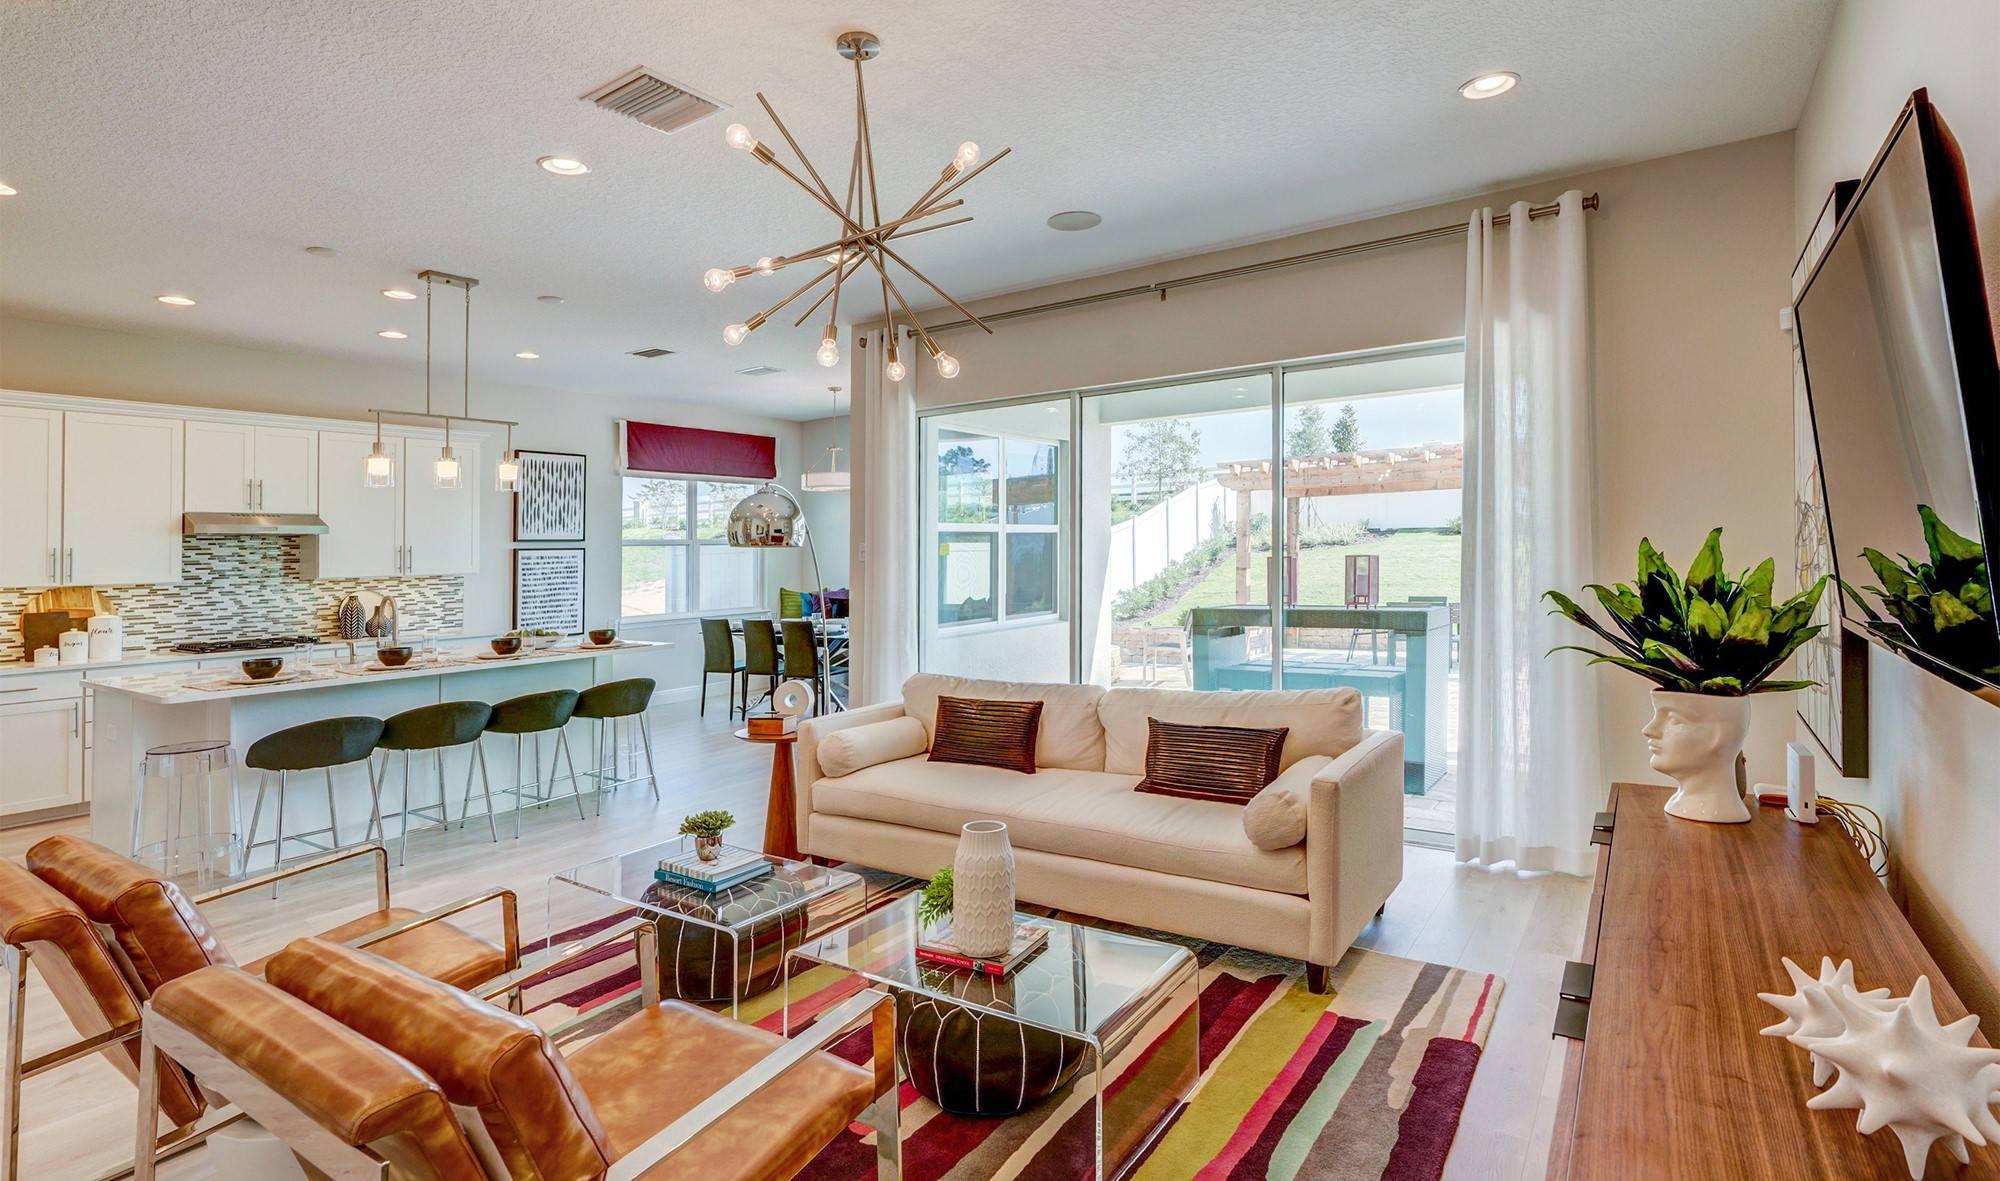 magnolia-at-westside-sanya-great-room-2.